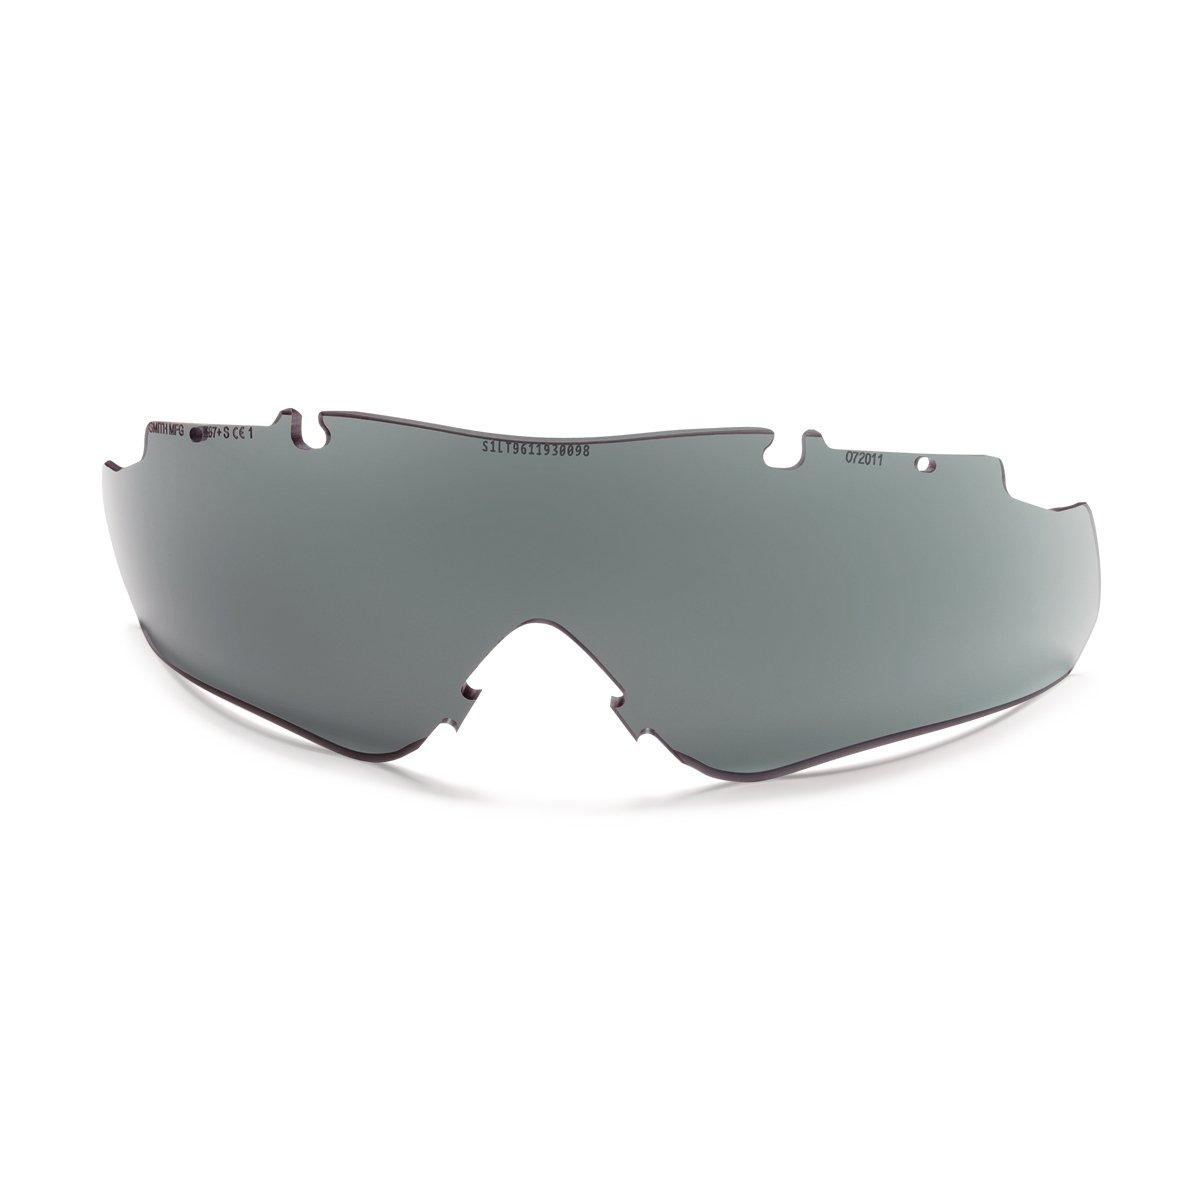 Smith Optics Aegis Arc/Echo/Echo II Compact Elite Tactical Eyeshield Replacement Lens Smith Optics Elite/Tactical AEGCLNSCL